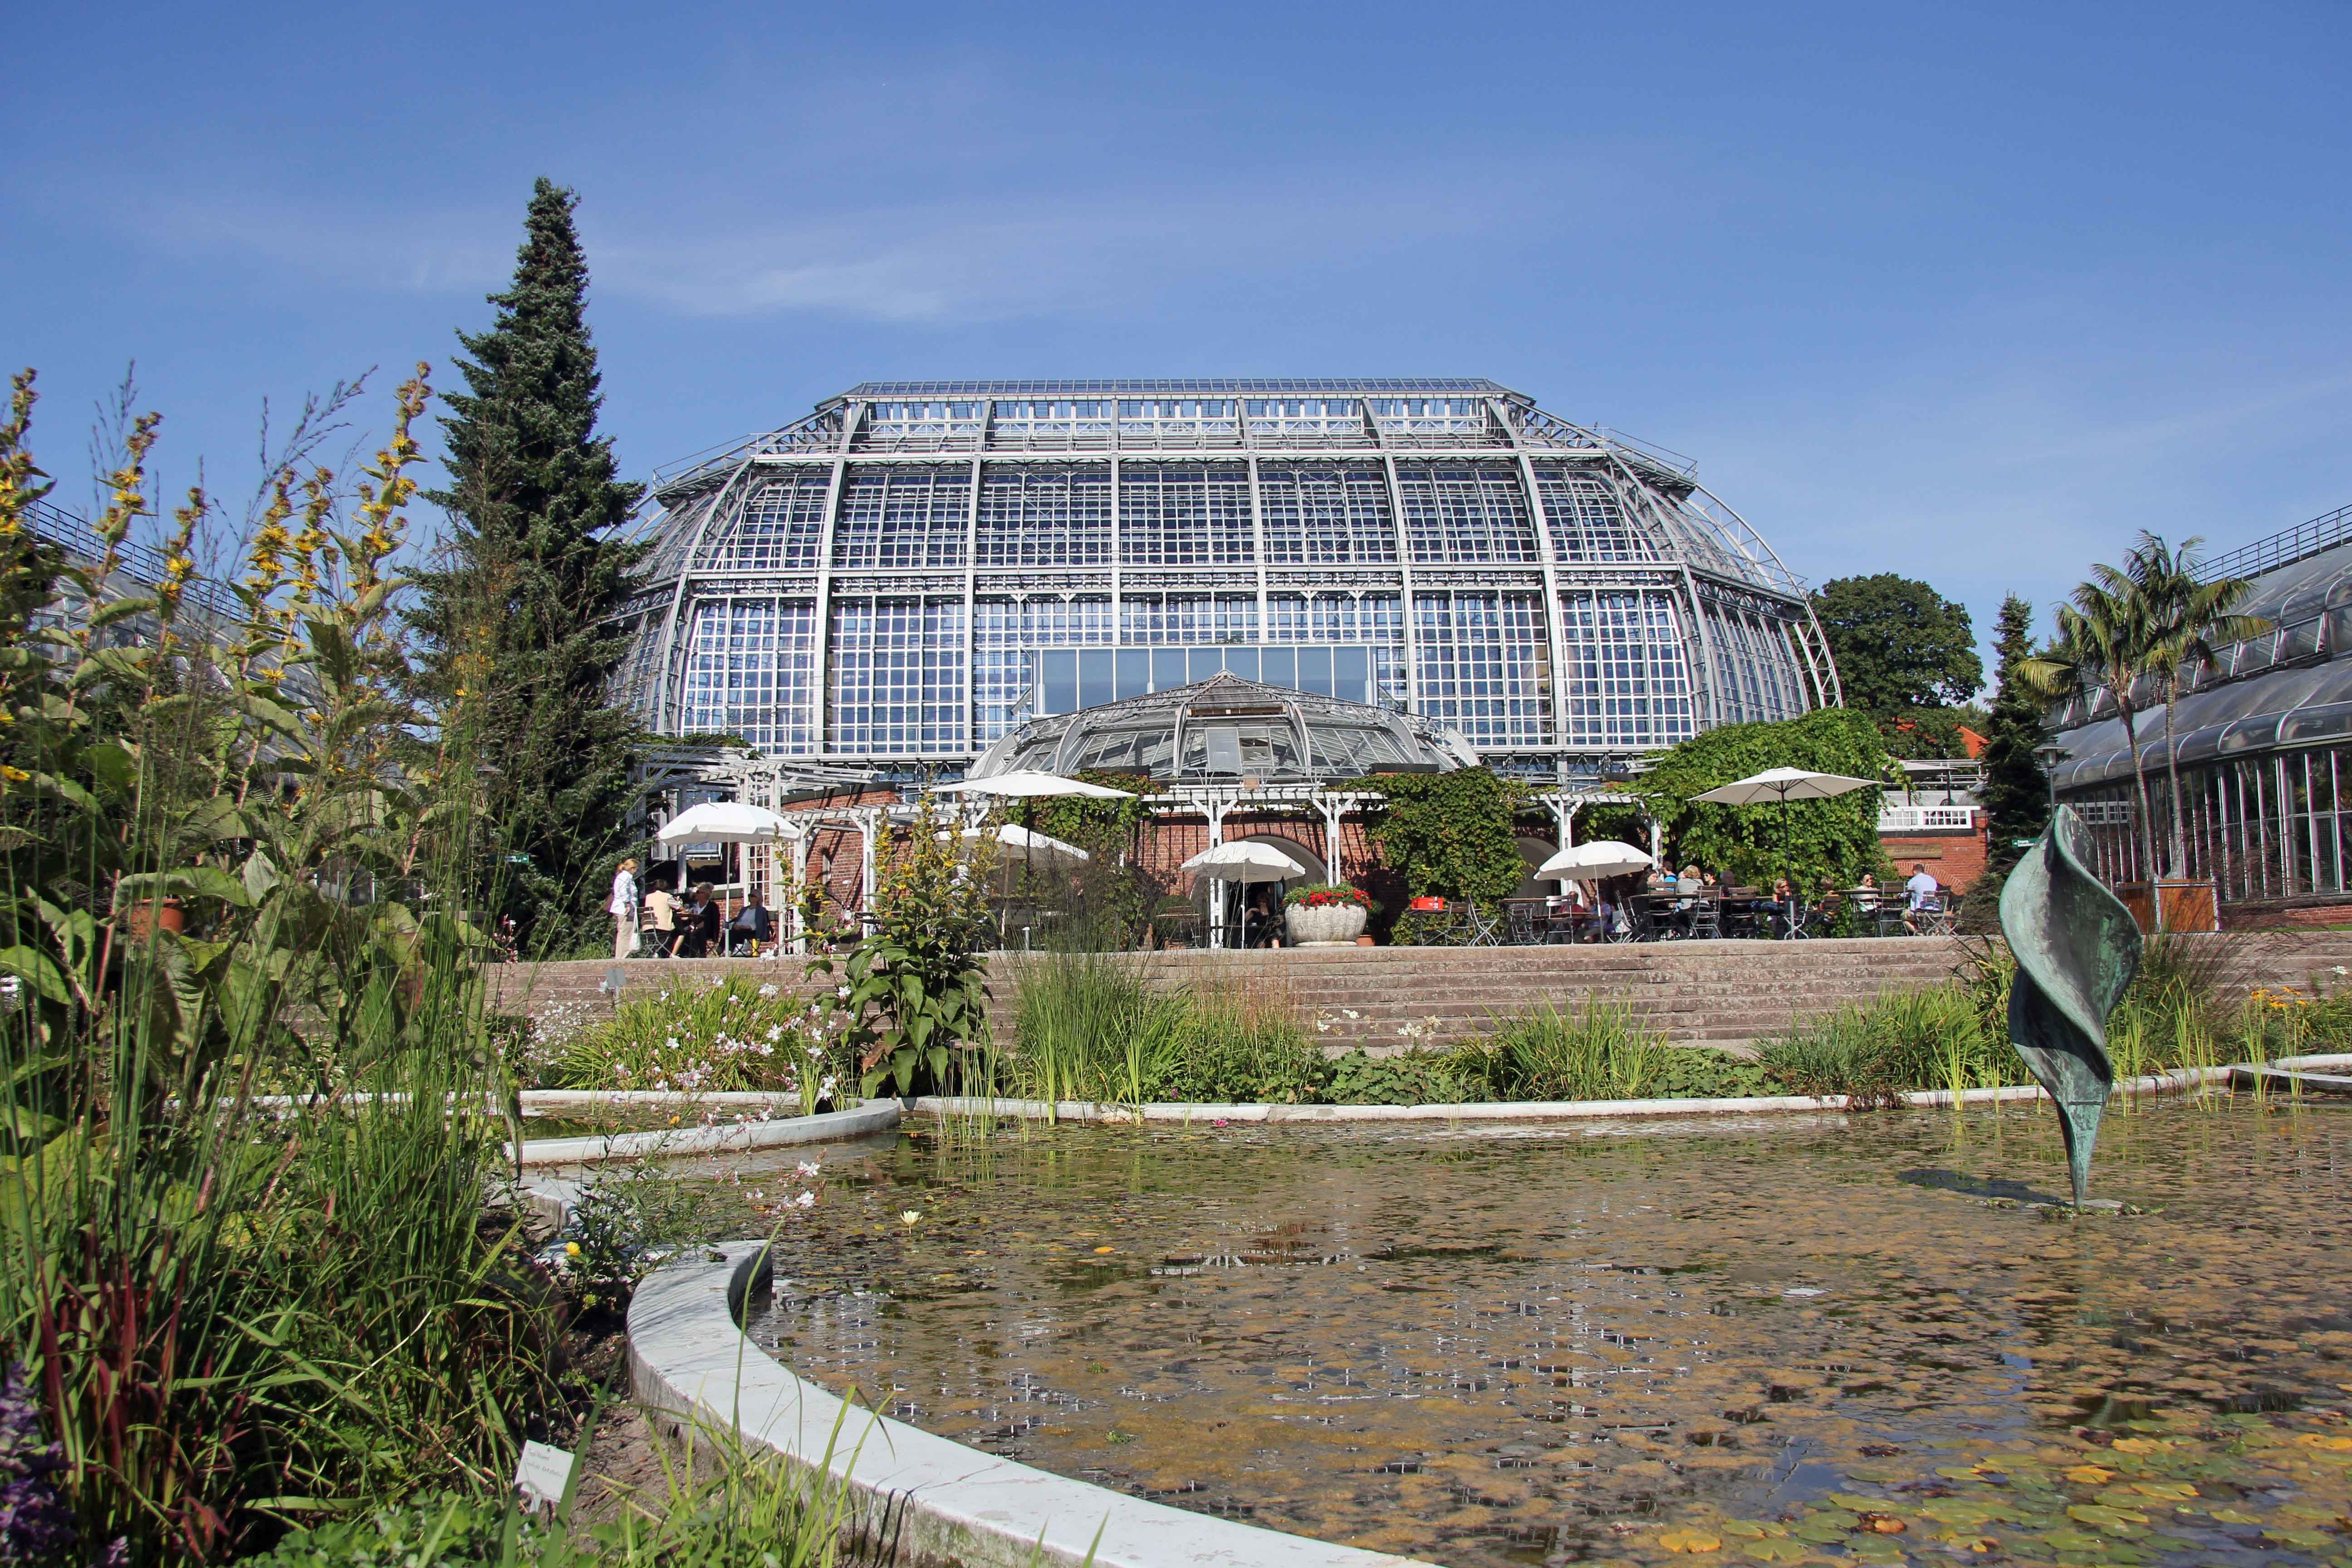 Botanischer Garten Und Botanisches Museum Berlin Dahlem Berlin Love